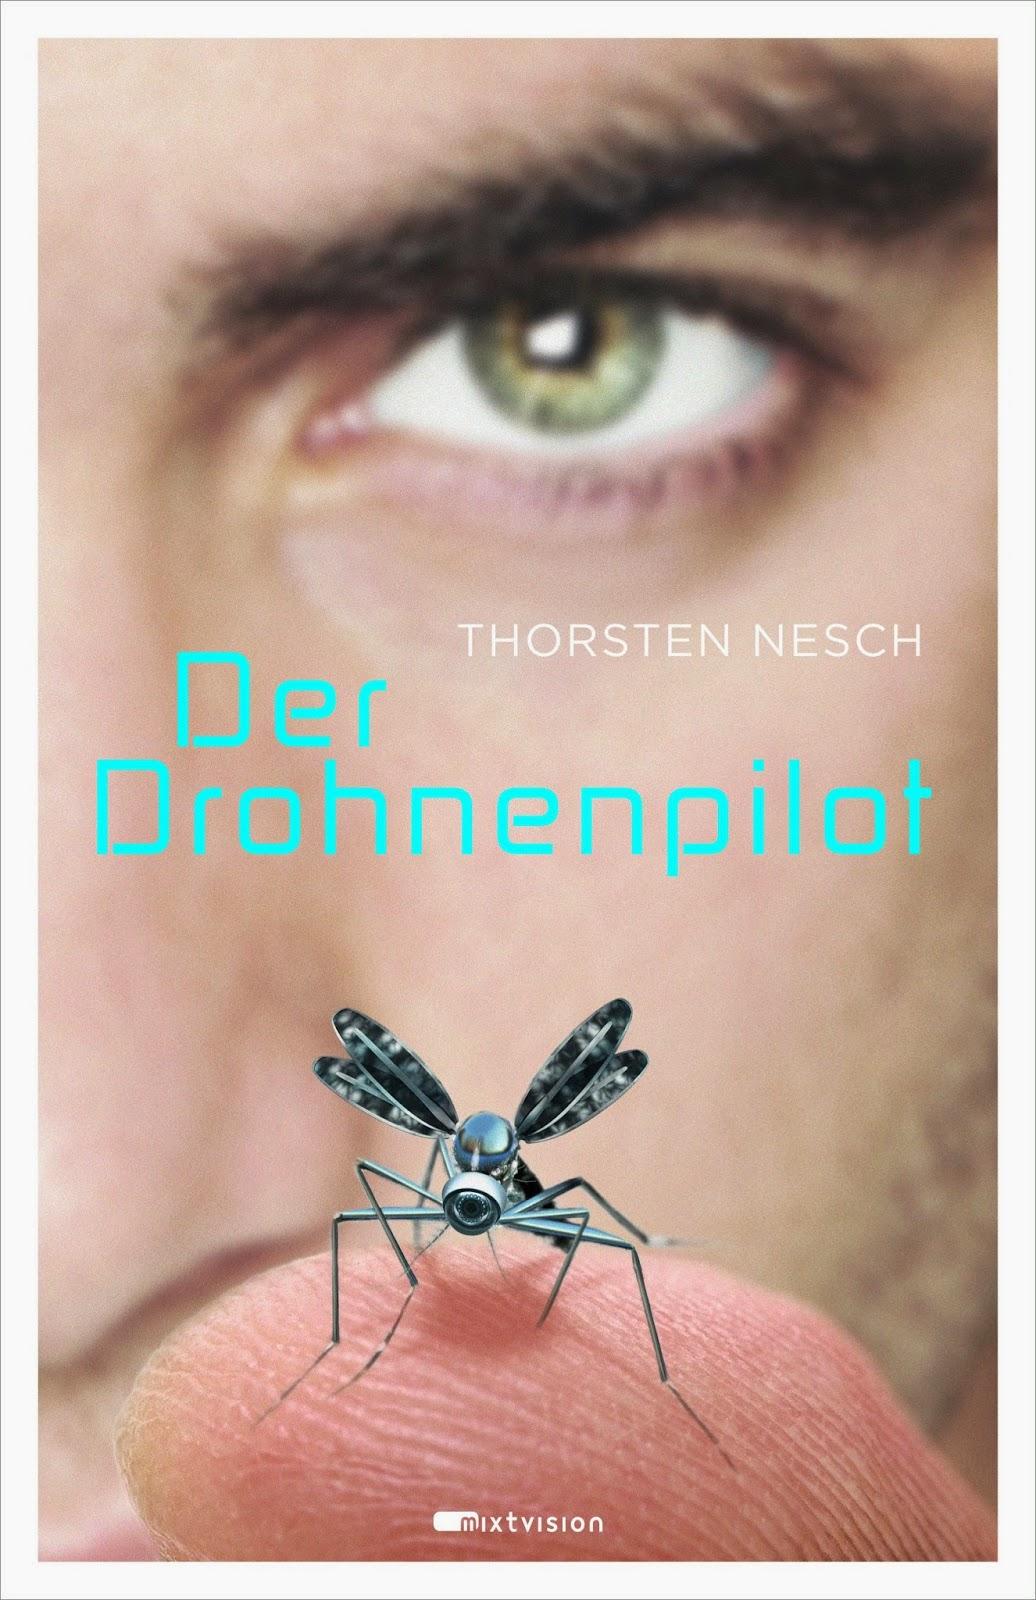 http://www.amazon.de/Drohnenpilot-Thorsten-Nesch/dp/3958540244/ref=sr_1_1_twi_1?ie=UTF8&qid=1422724203&sr=8-1&keywords=der+drohnenpilot